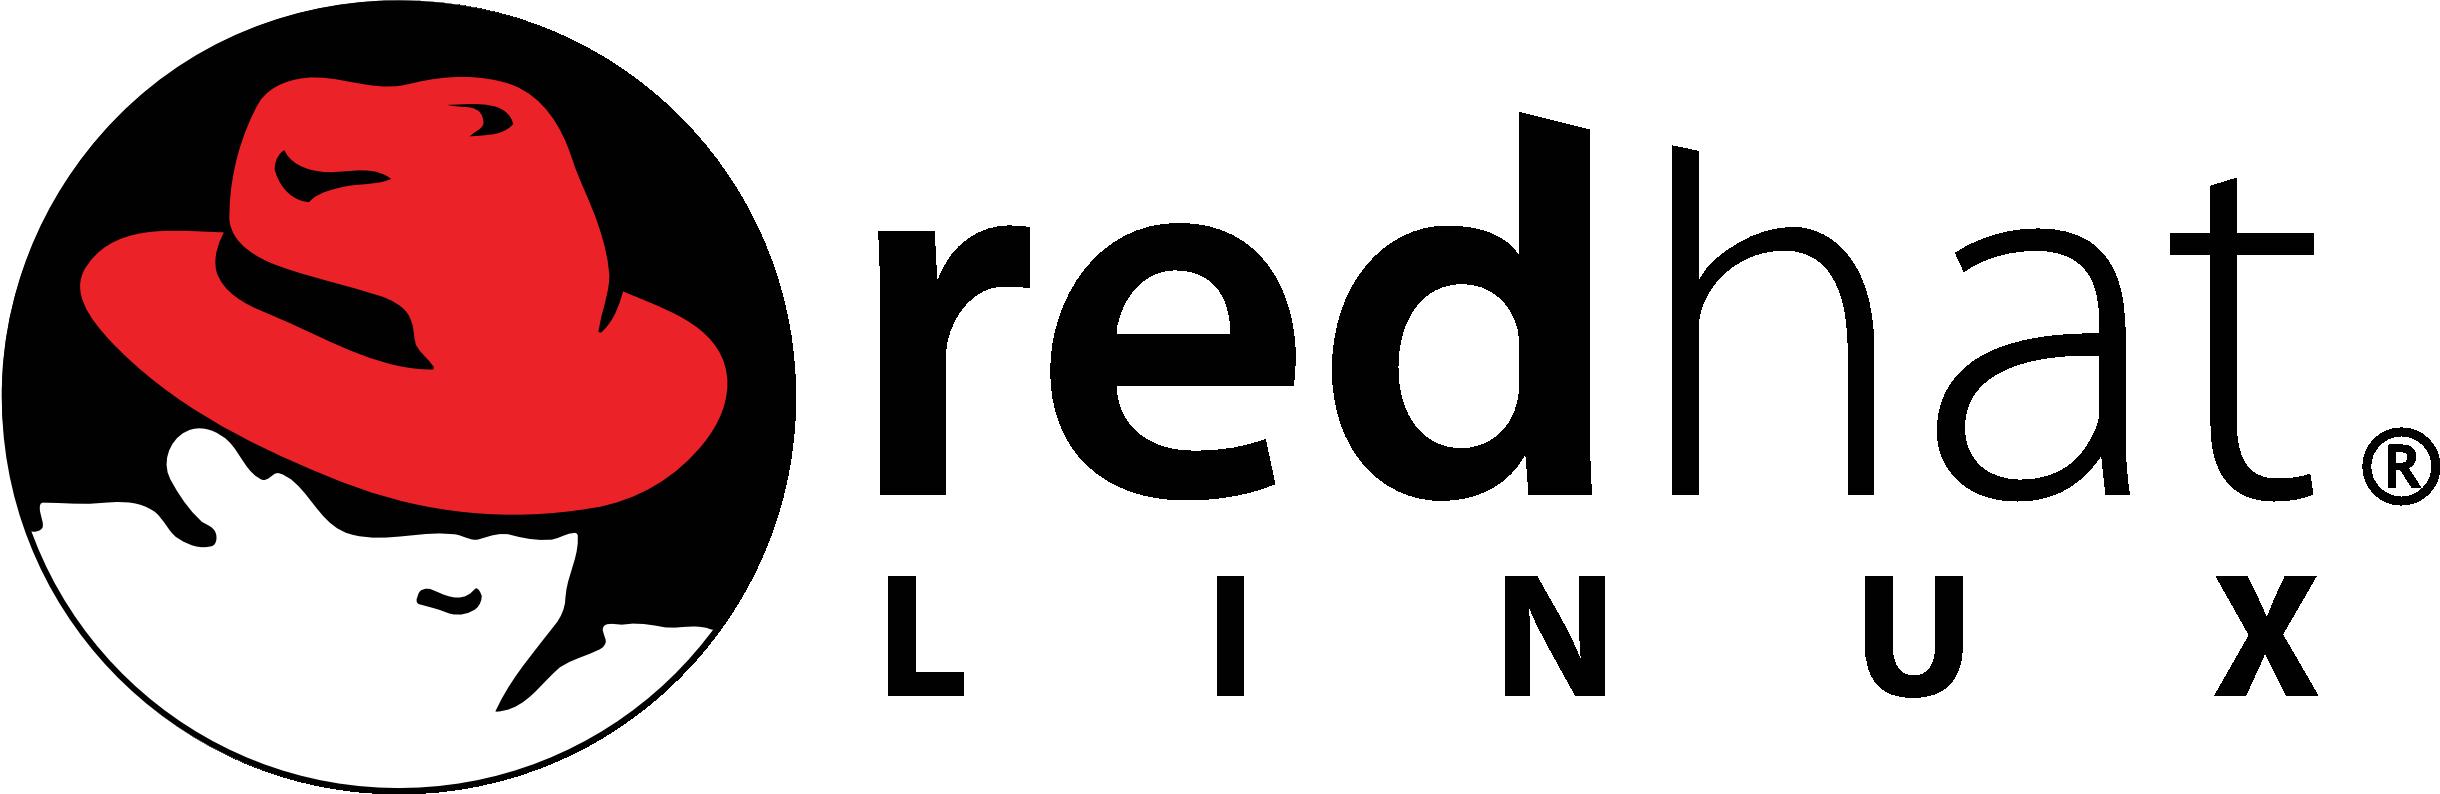 fichierred hat logopng � wikip233dia